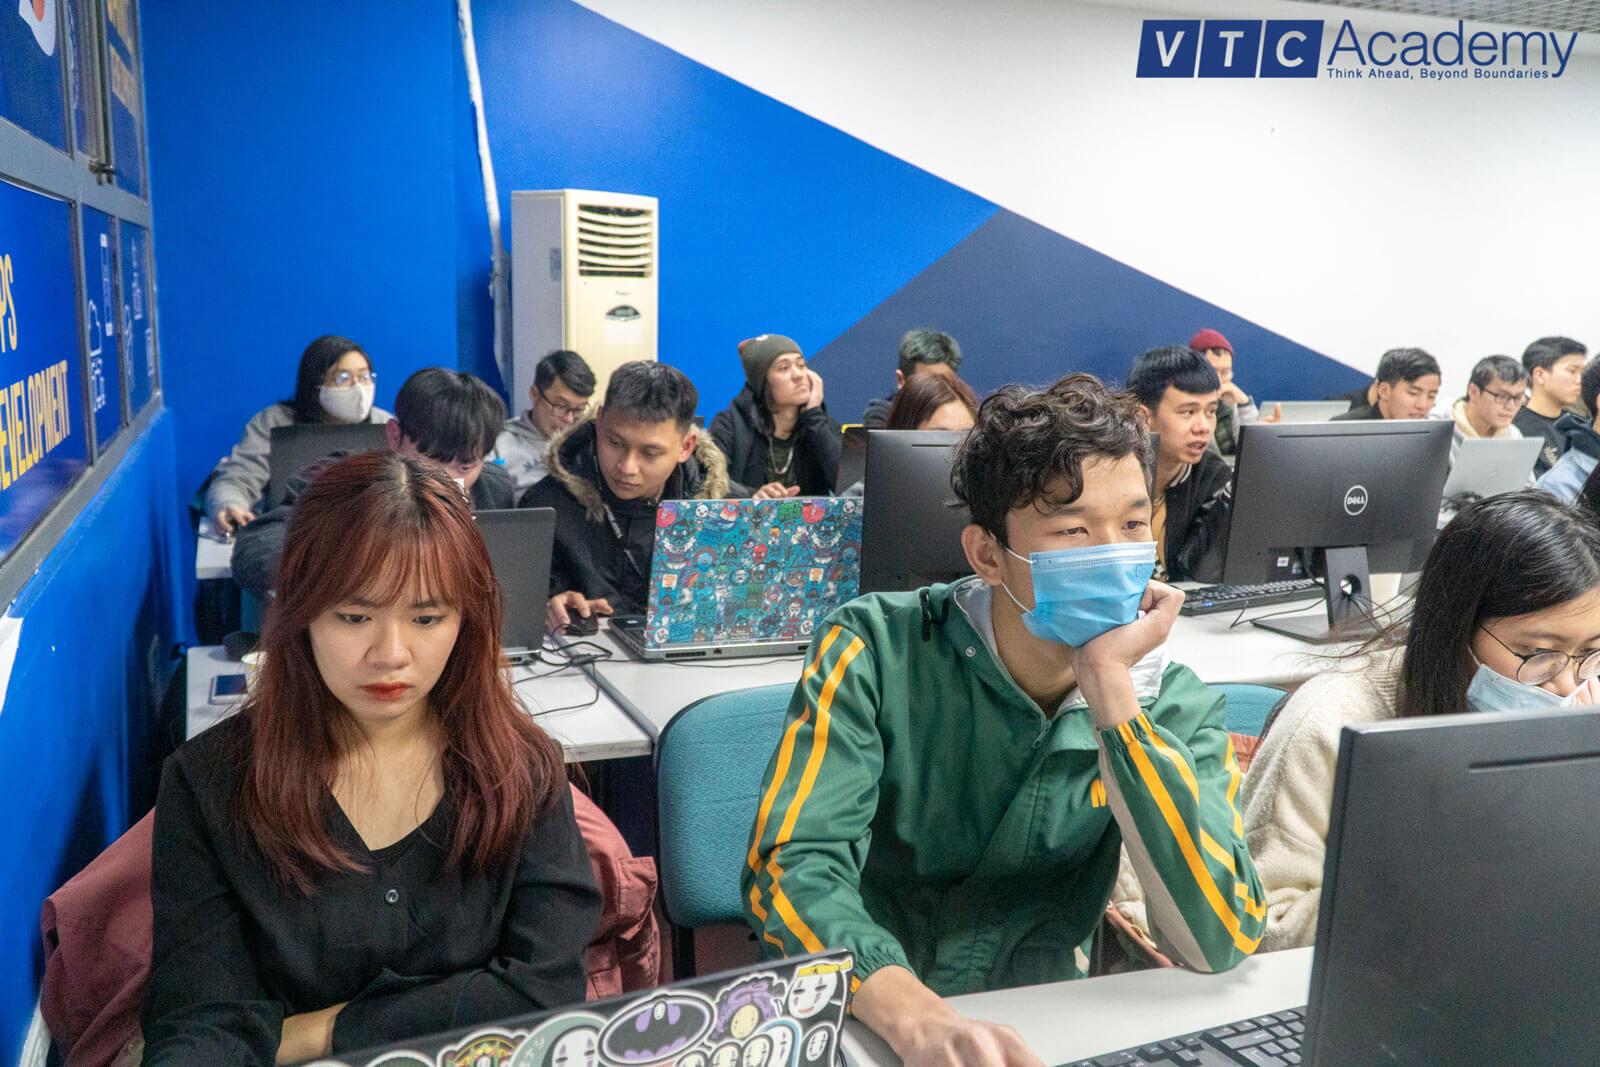 2d-bootcamp-vtc-academy-10